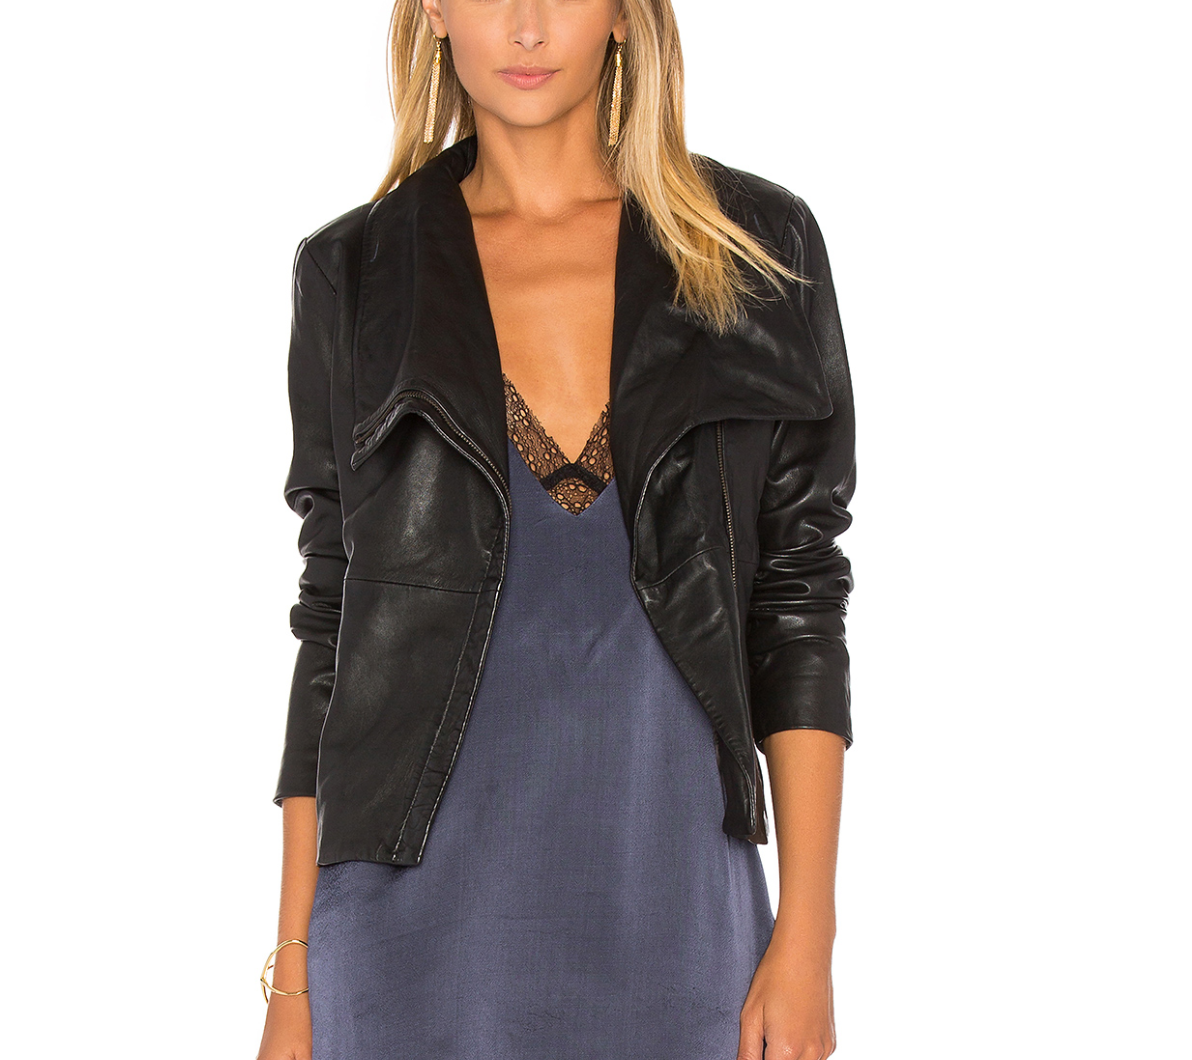 BB Dakota newell leather jacket $400